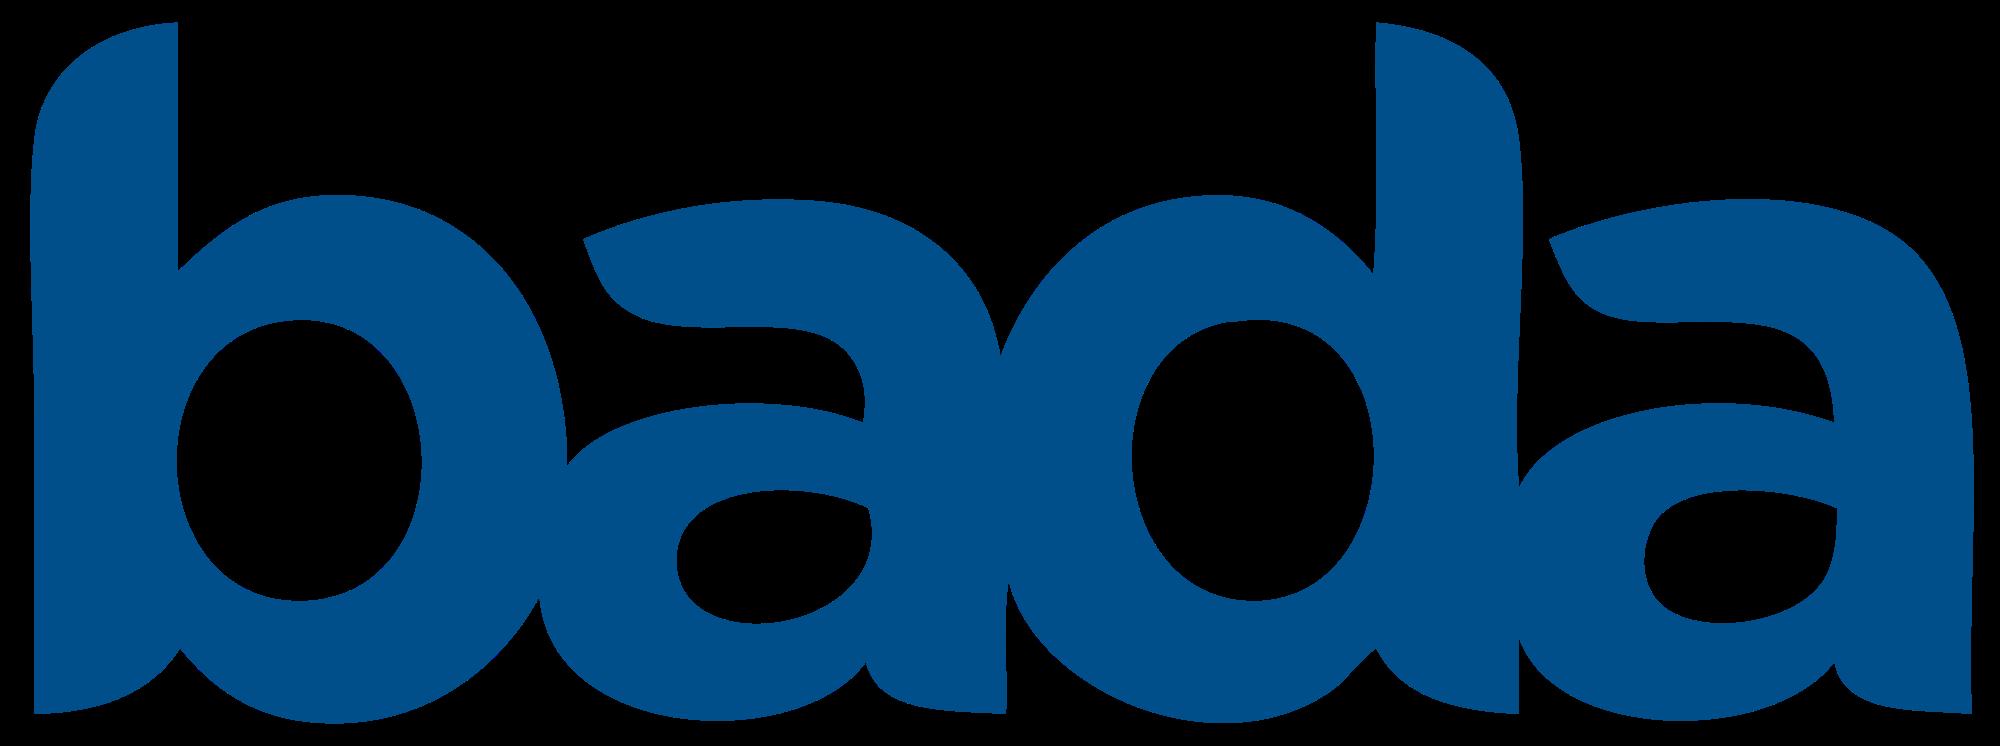 Bada Mobile Operating System Logo